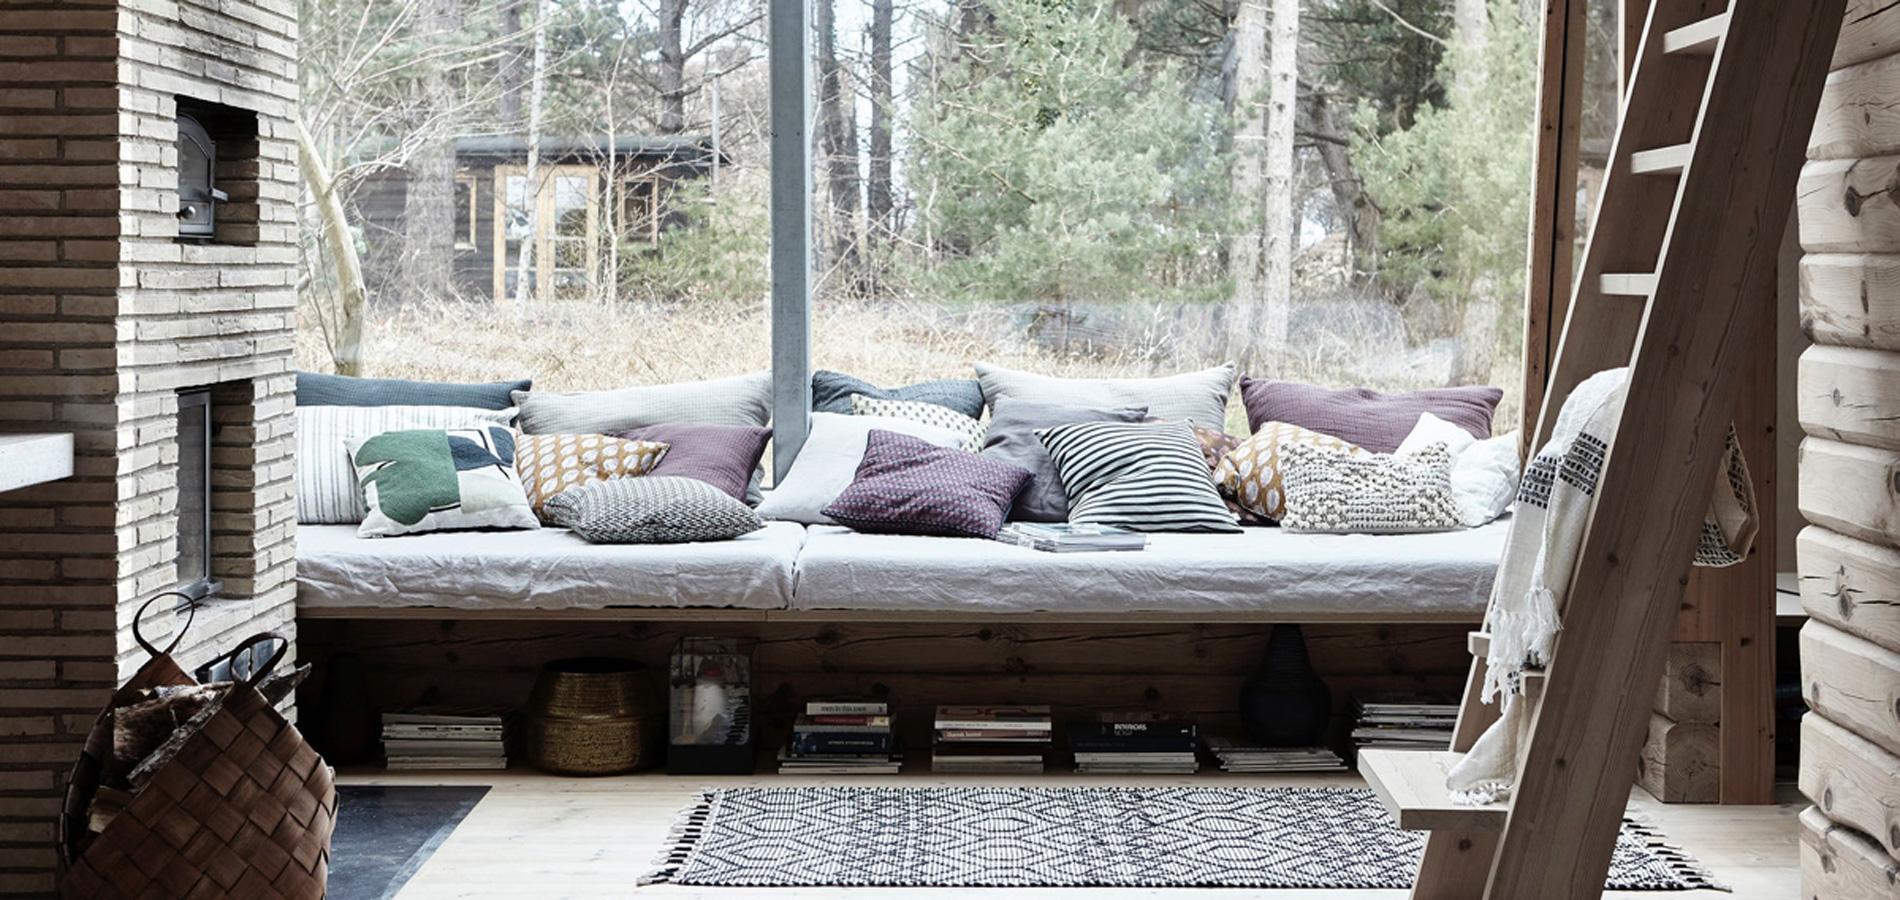 refaire sa chambre a moindre cout. Black Bedroom Furniture Sets. Home Design Ideas